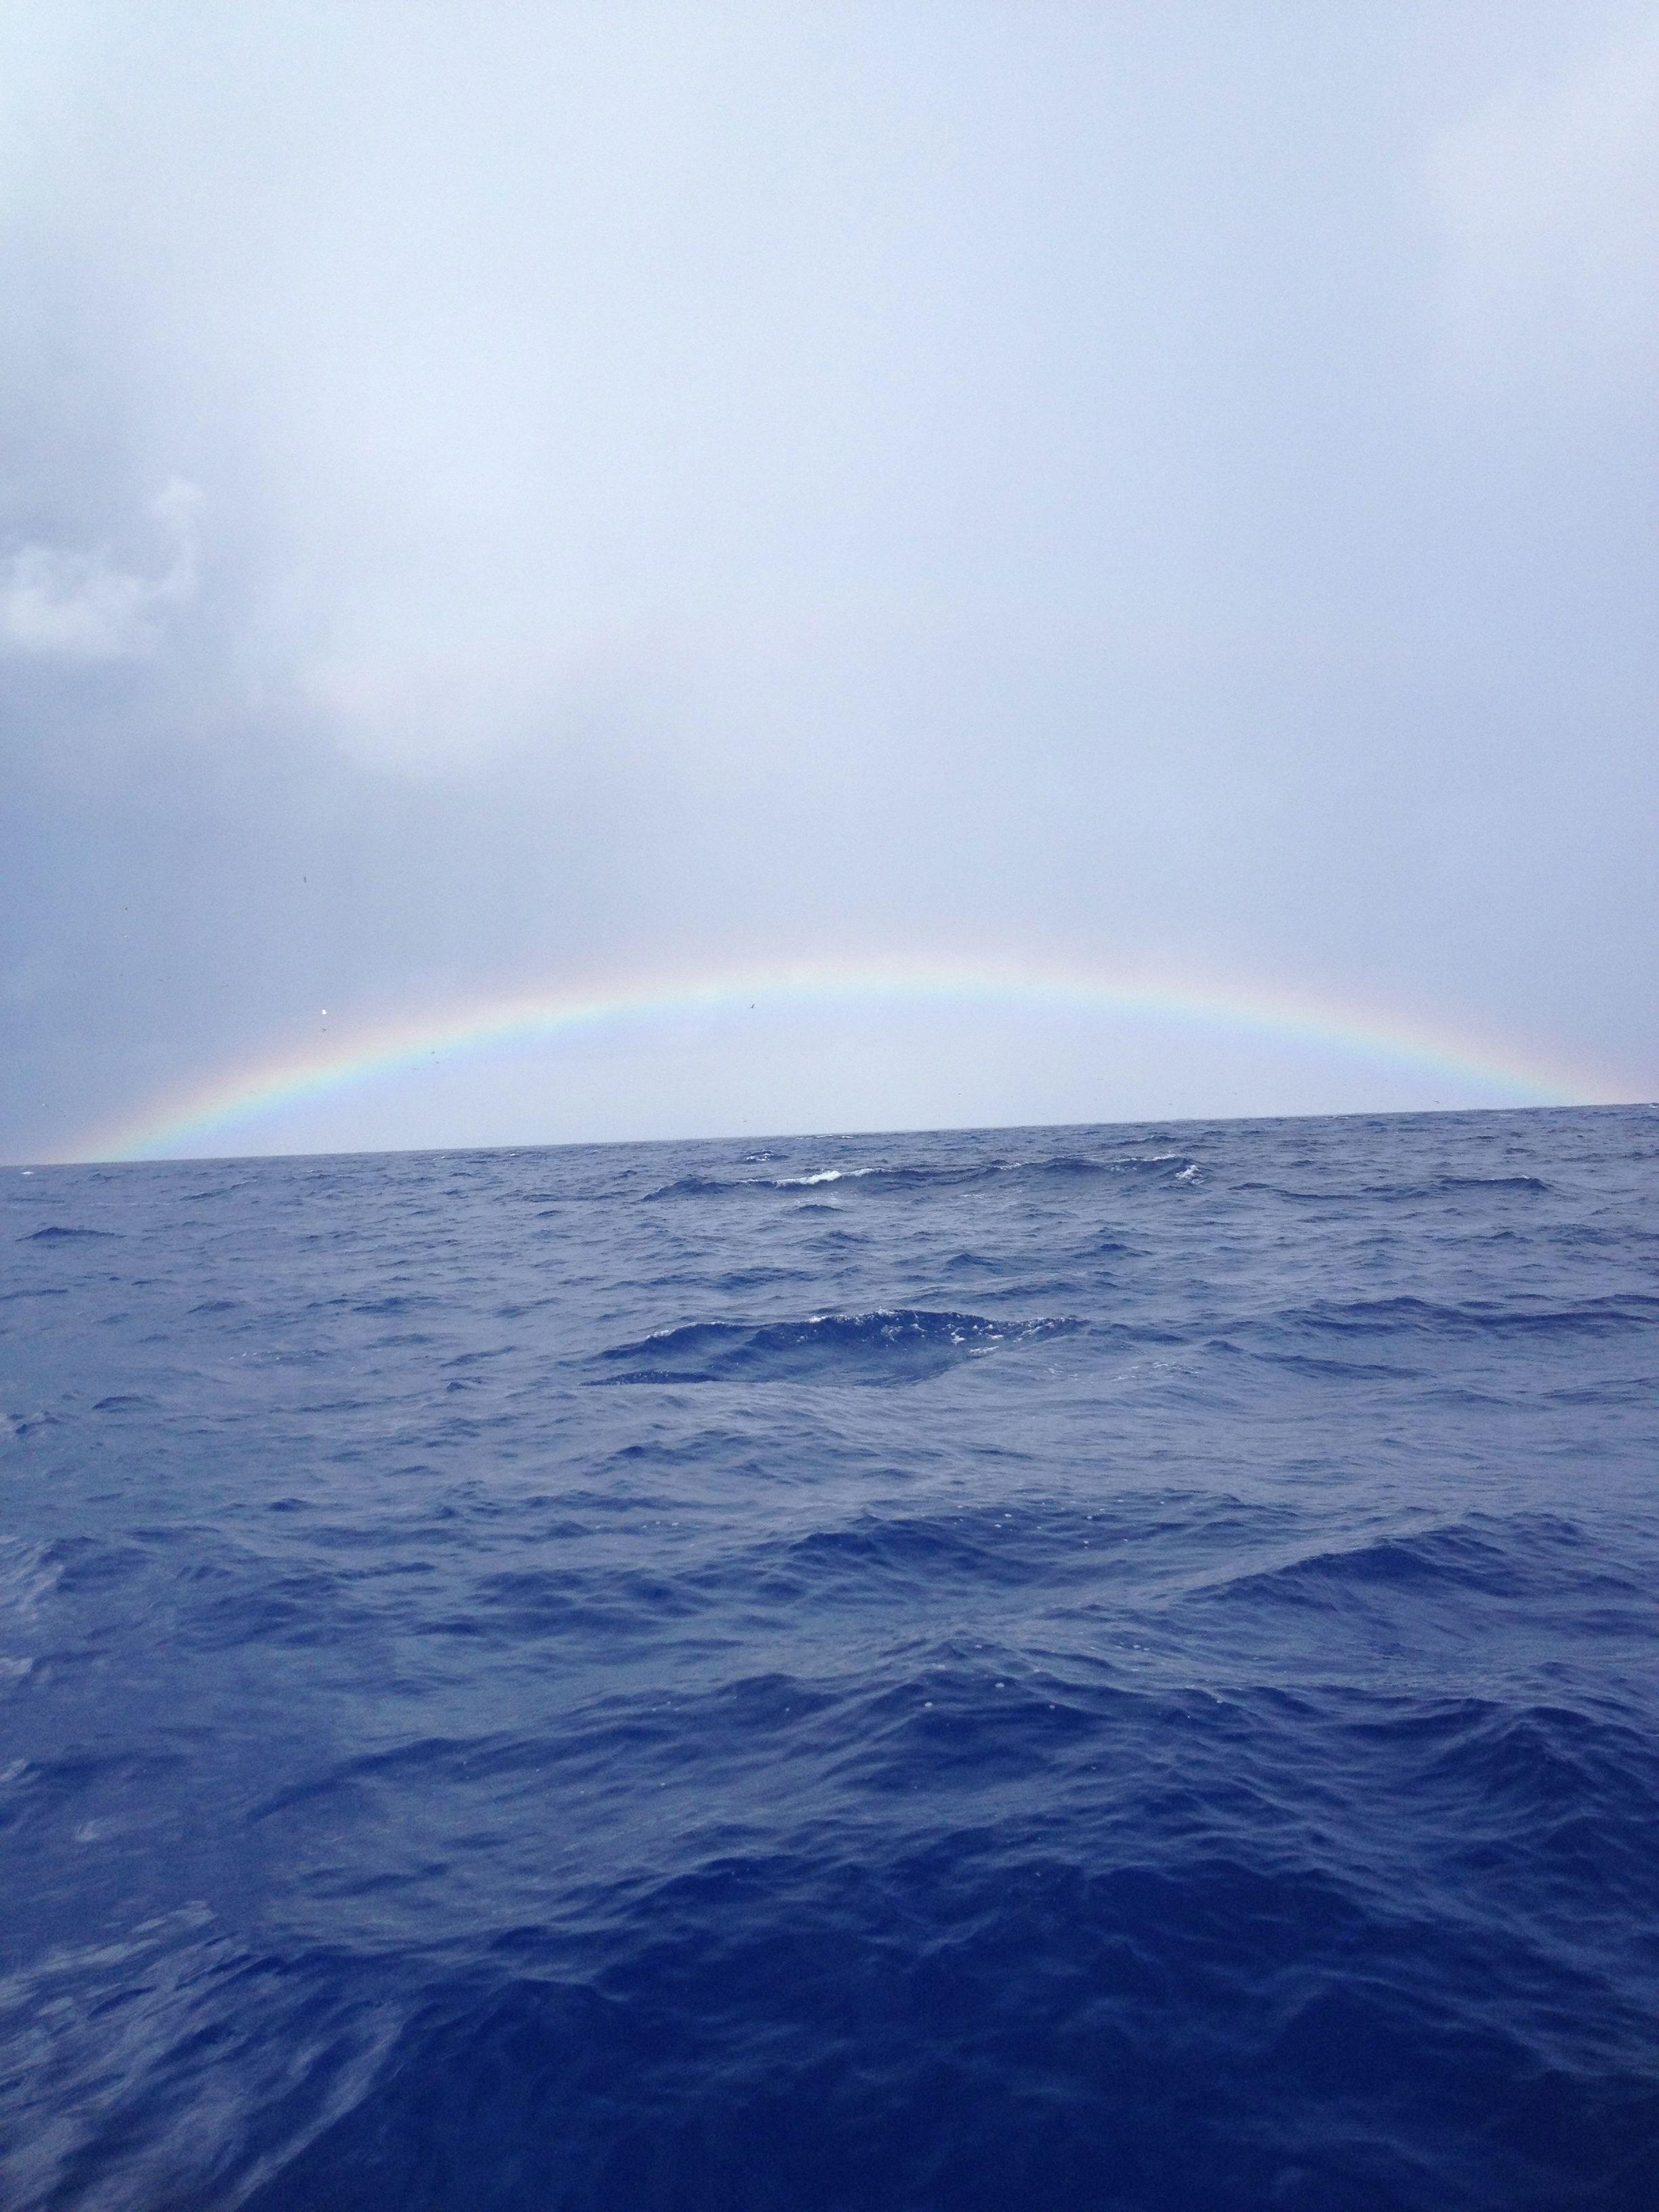 Anybody see a rainbow today? #fearlessfishing #cpatjoehendrix #misterweatherman